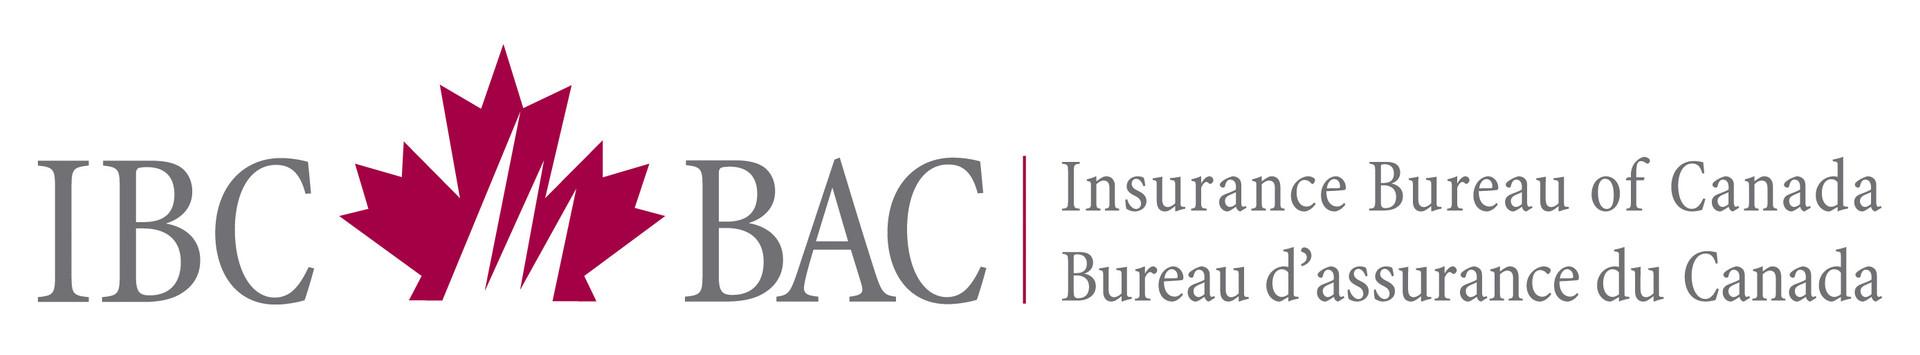 IBC bilingual logo_rgb.jpg